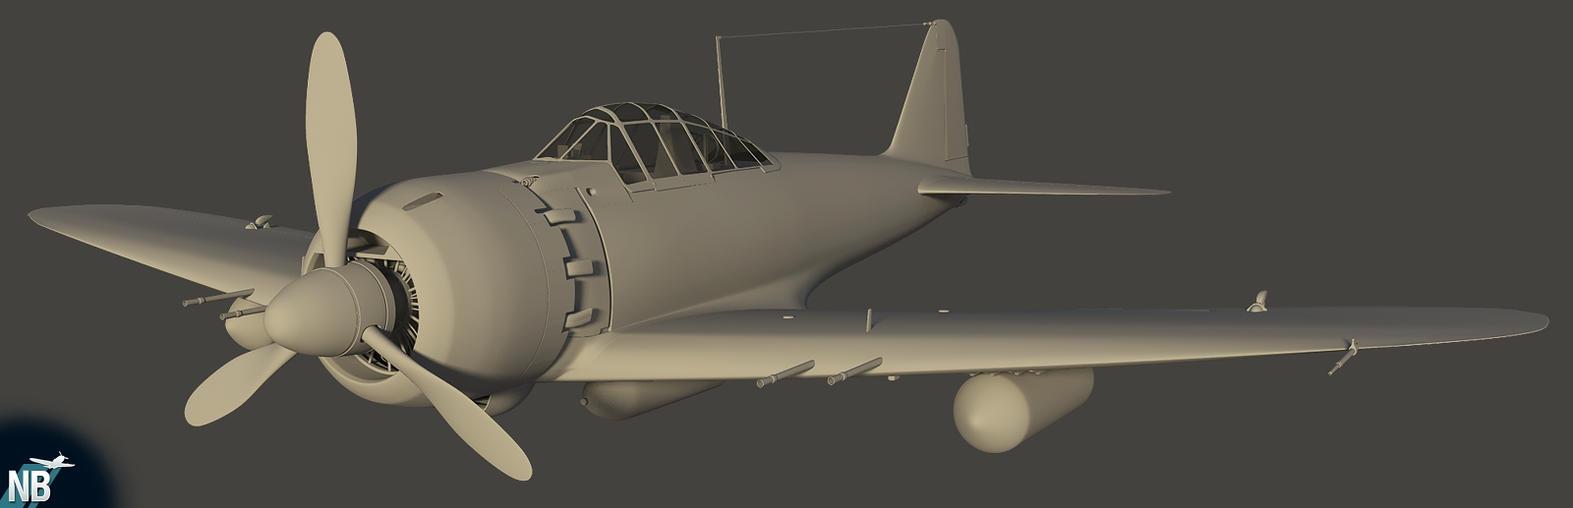 Naval Battle Mitsubishi A6M Zero 329172860